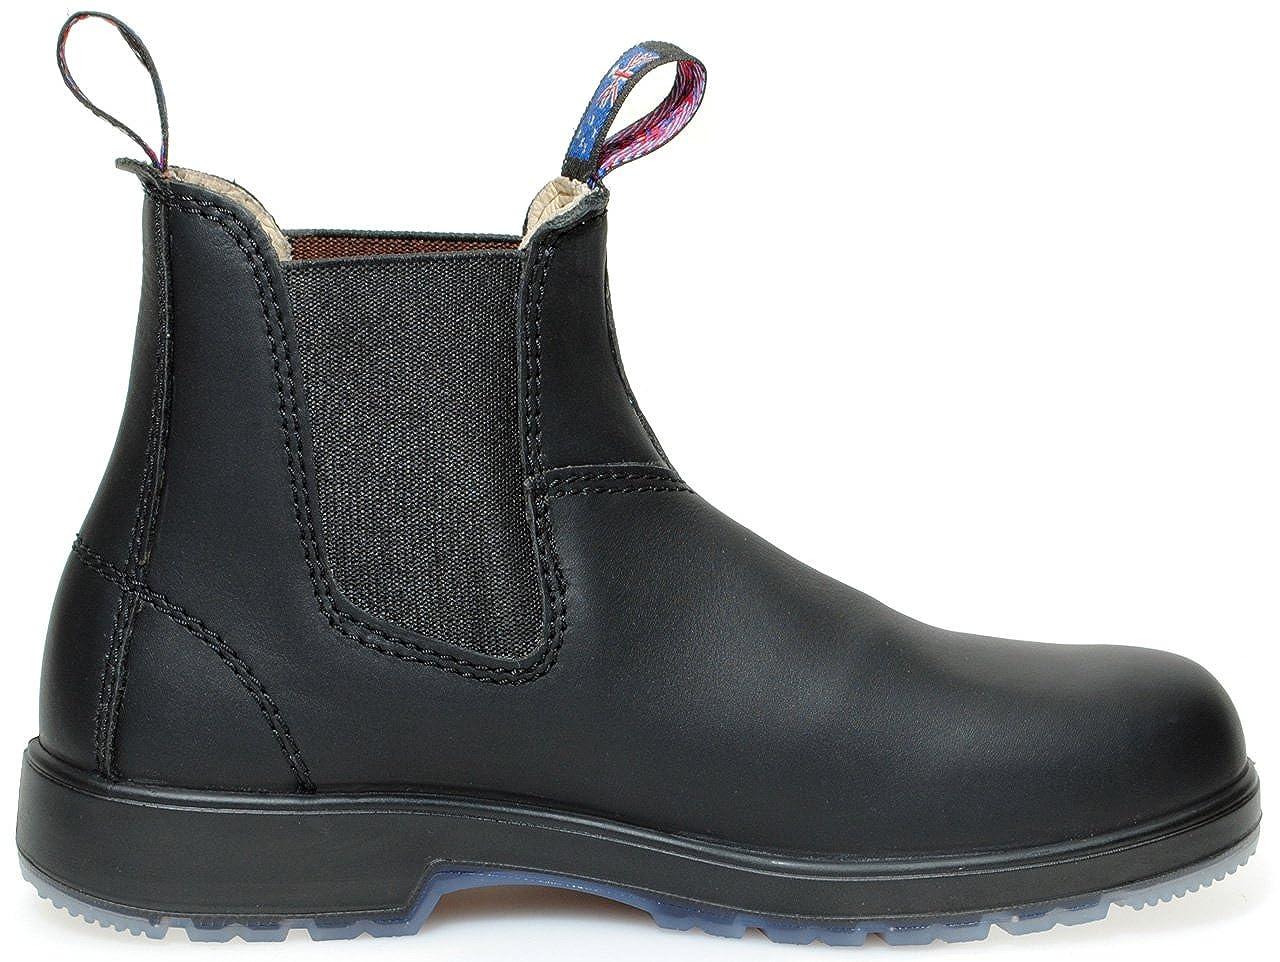 Blue Heeler - Australian Style Chelsea Boots / black schmale --narrow fit-- auch für schmale black Füße 38 dfeeec